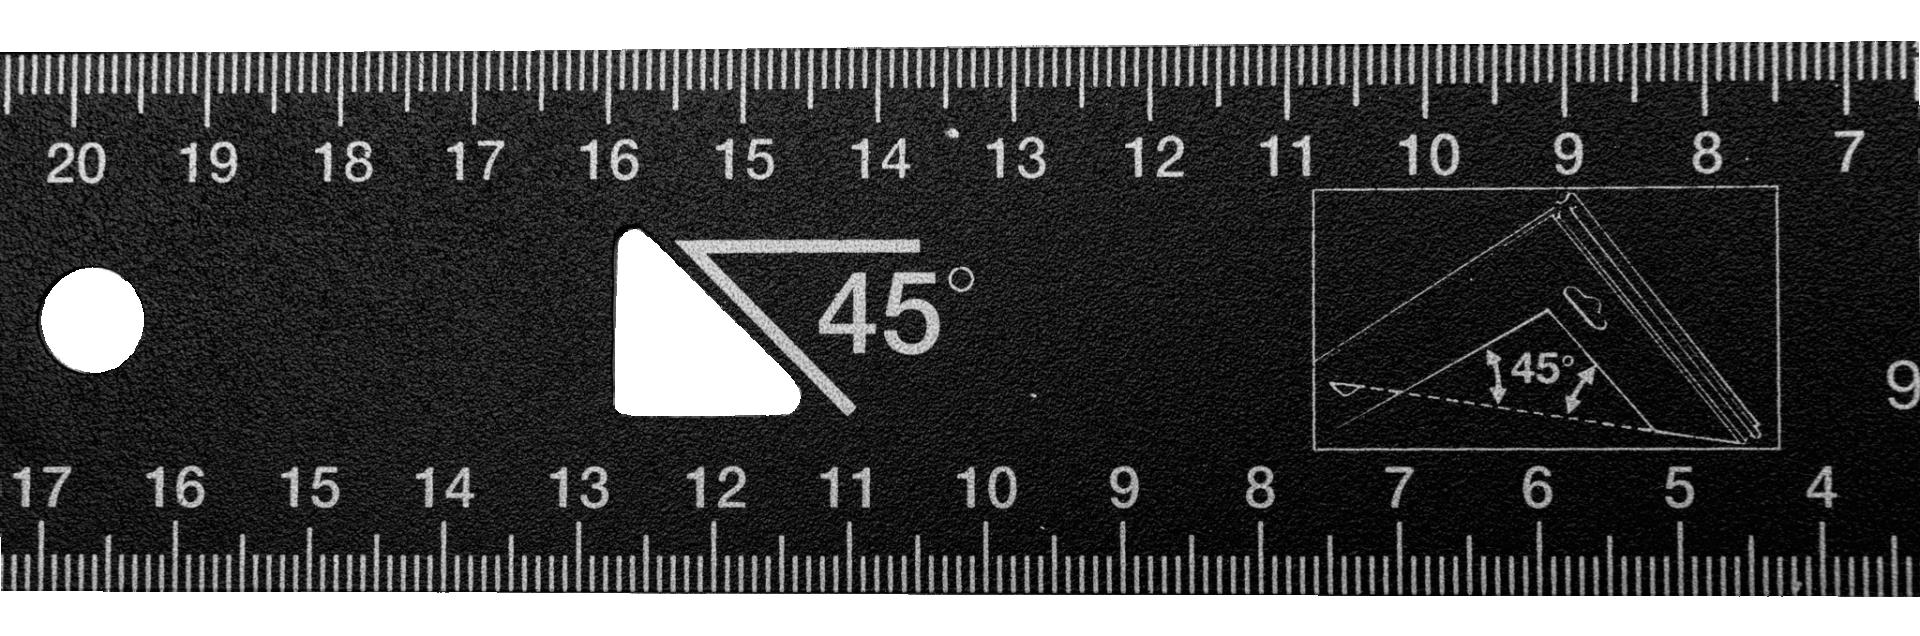 Kątownik 200 x 170 mm 90 i 45 stopni BAHCO (nr kat. 9045-B-200)